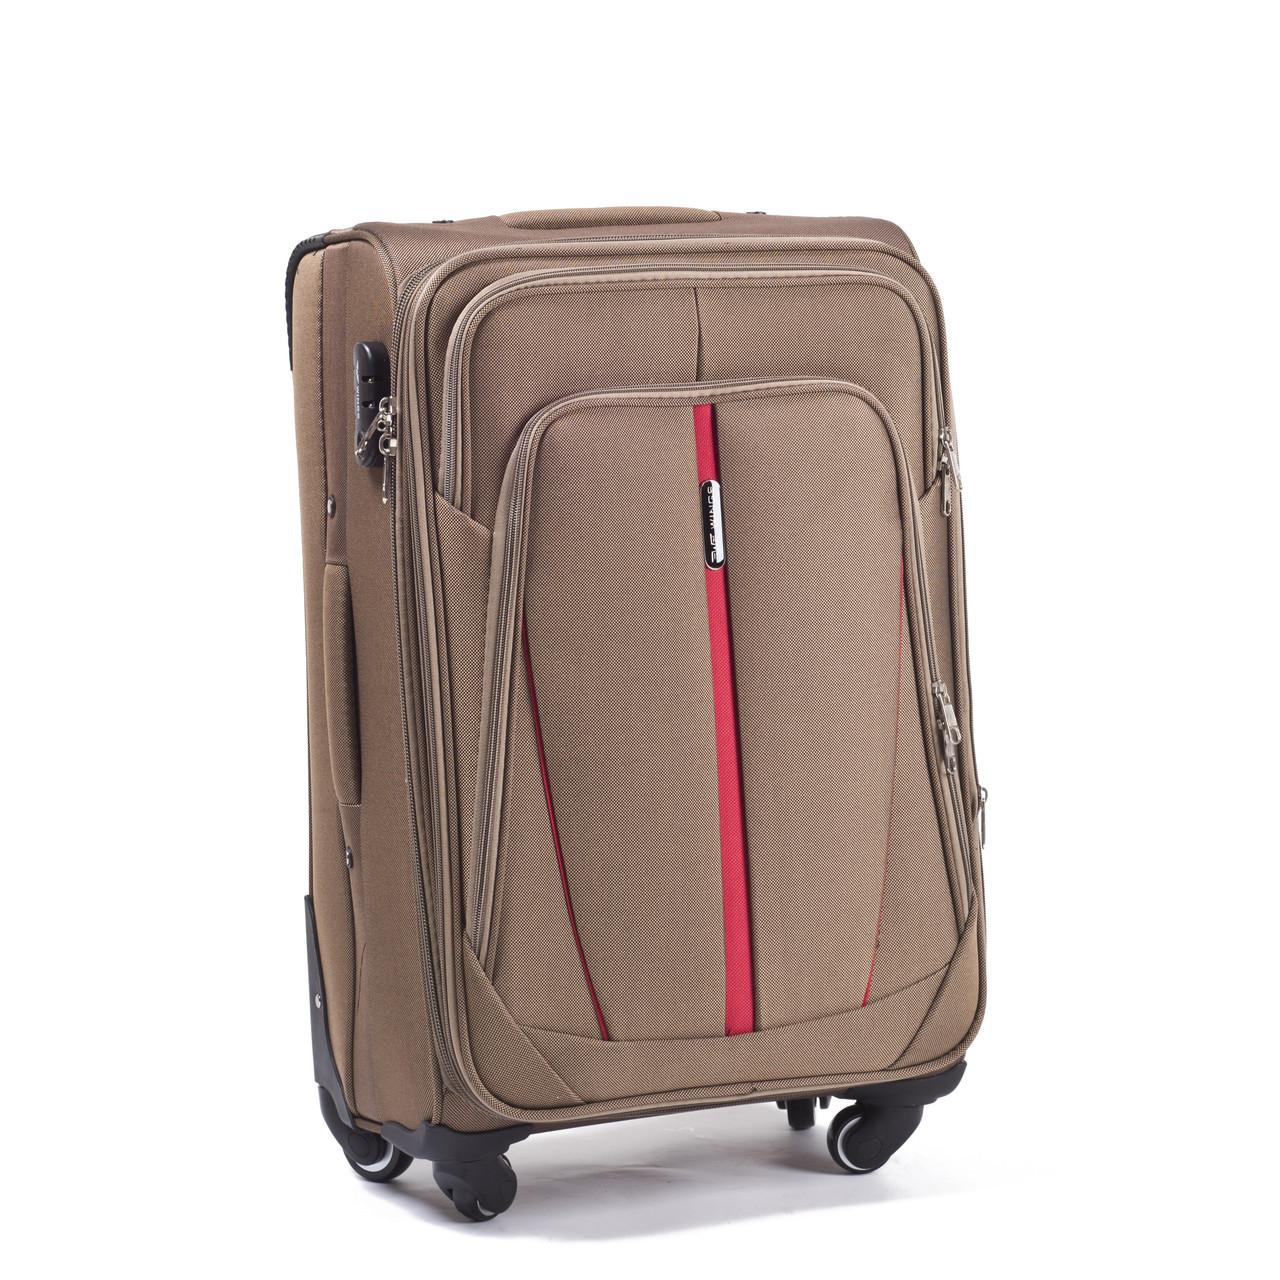 Малый тканевый чемодан Wings 1706 на 4 колесах бежевый